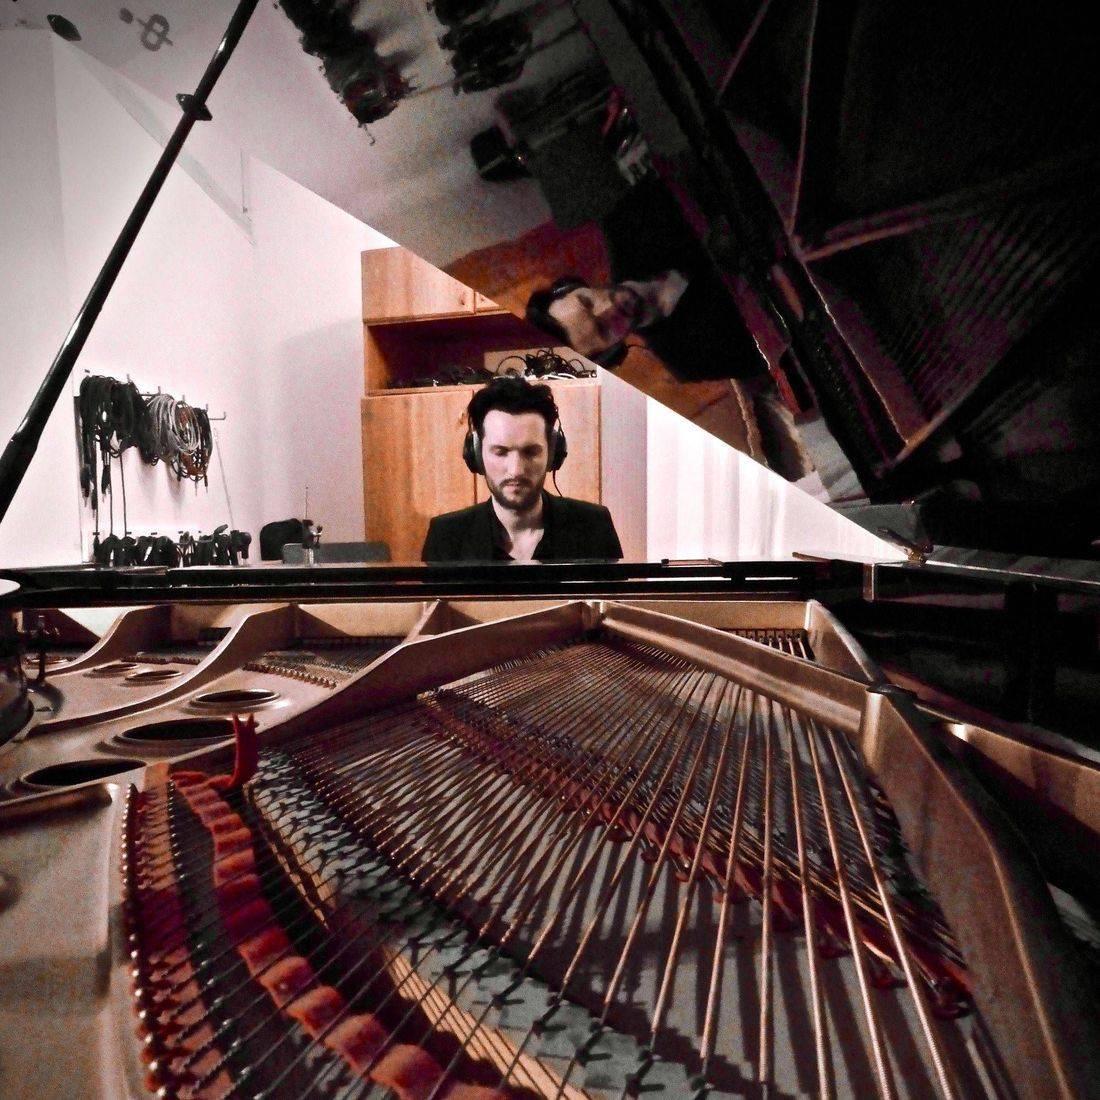 Bakermoon studio Berlin, recording, artist, musician,  poetry, piano, Blake Day